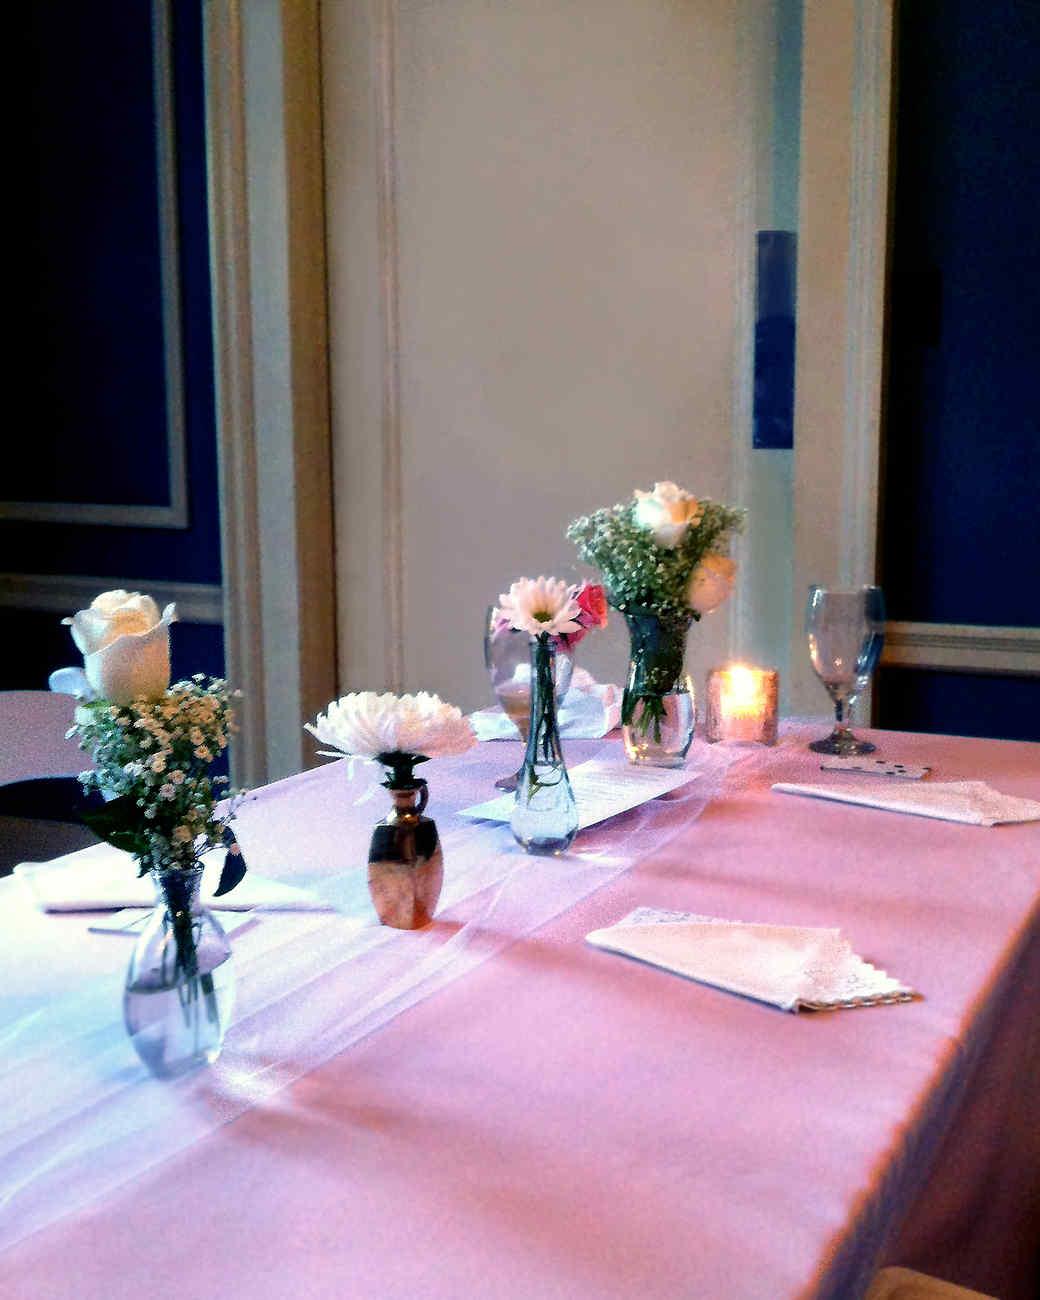 simple-candle-flower-thanksgiving-table-setting-juheakim-1115.jpg